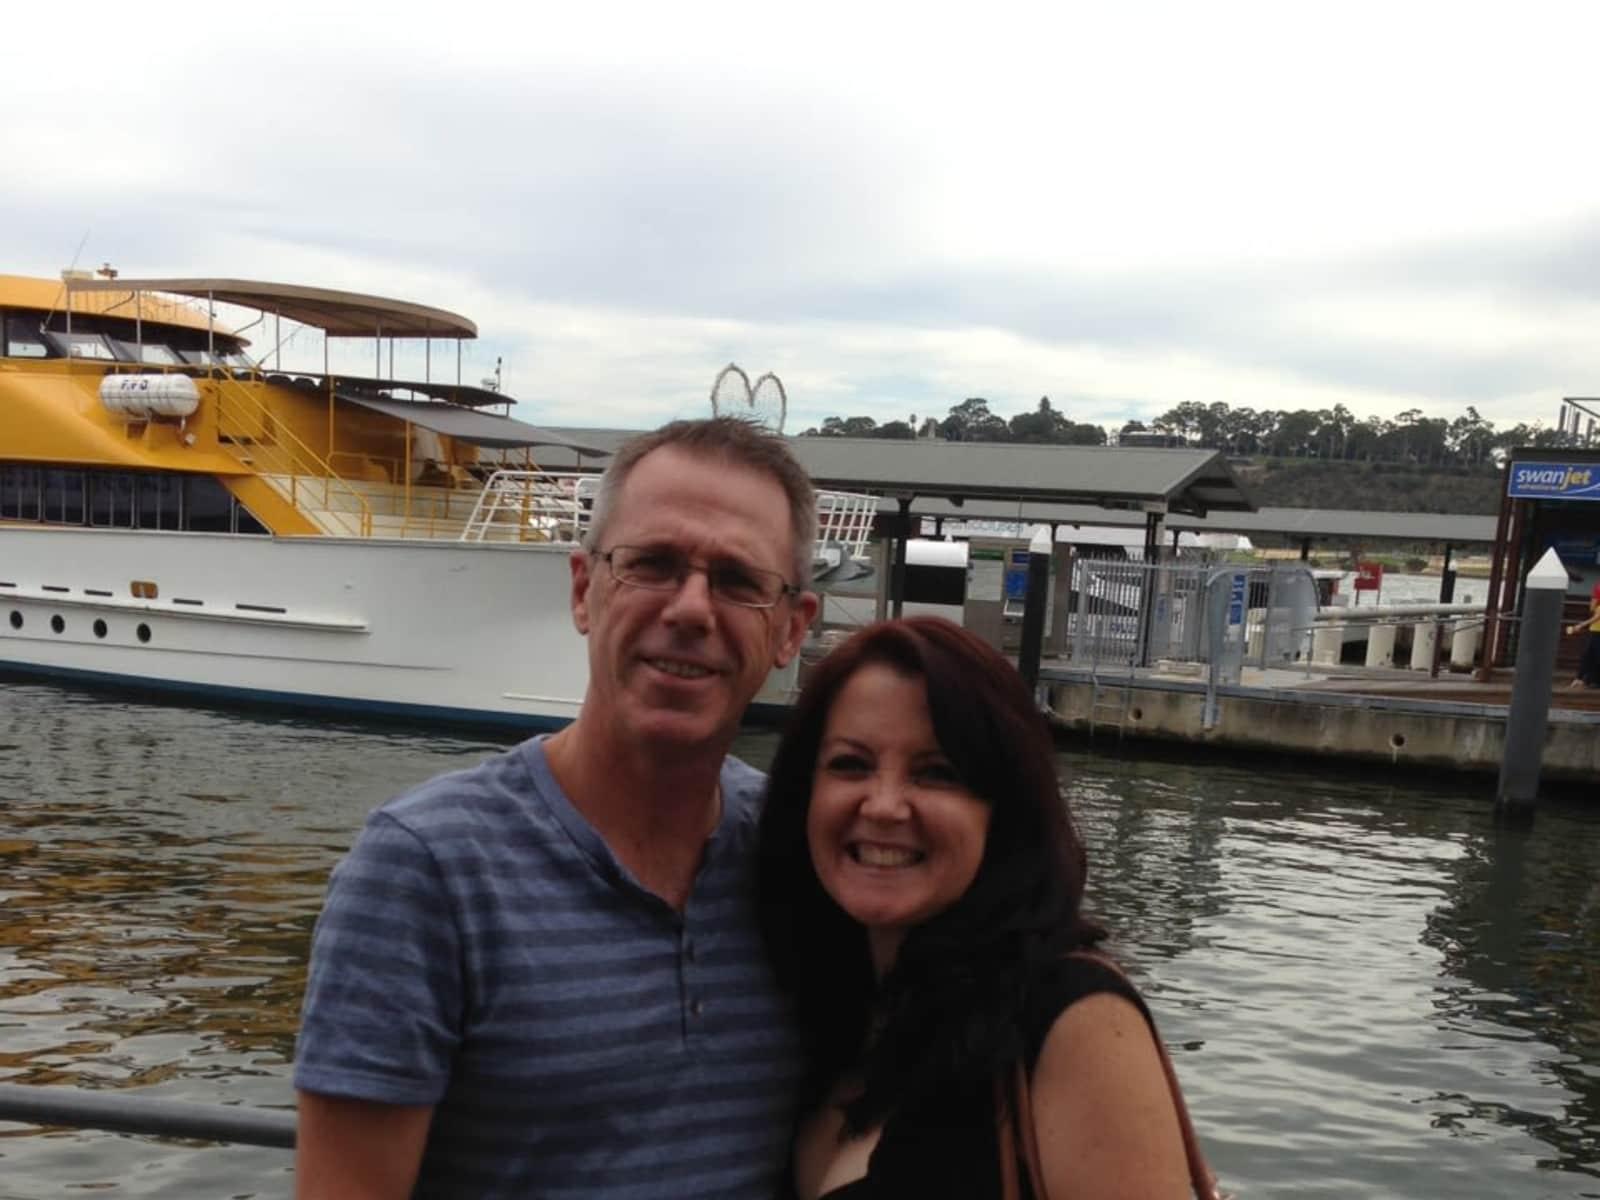 Rhonda & Mark from Perth, Western Australia, Australia